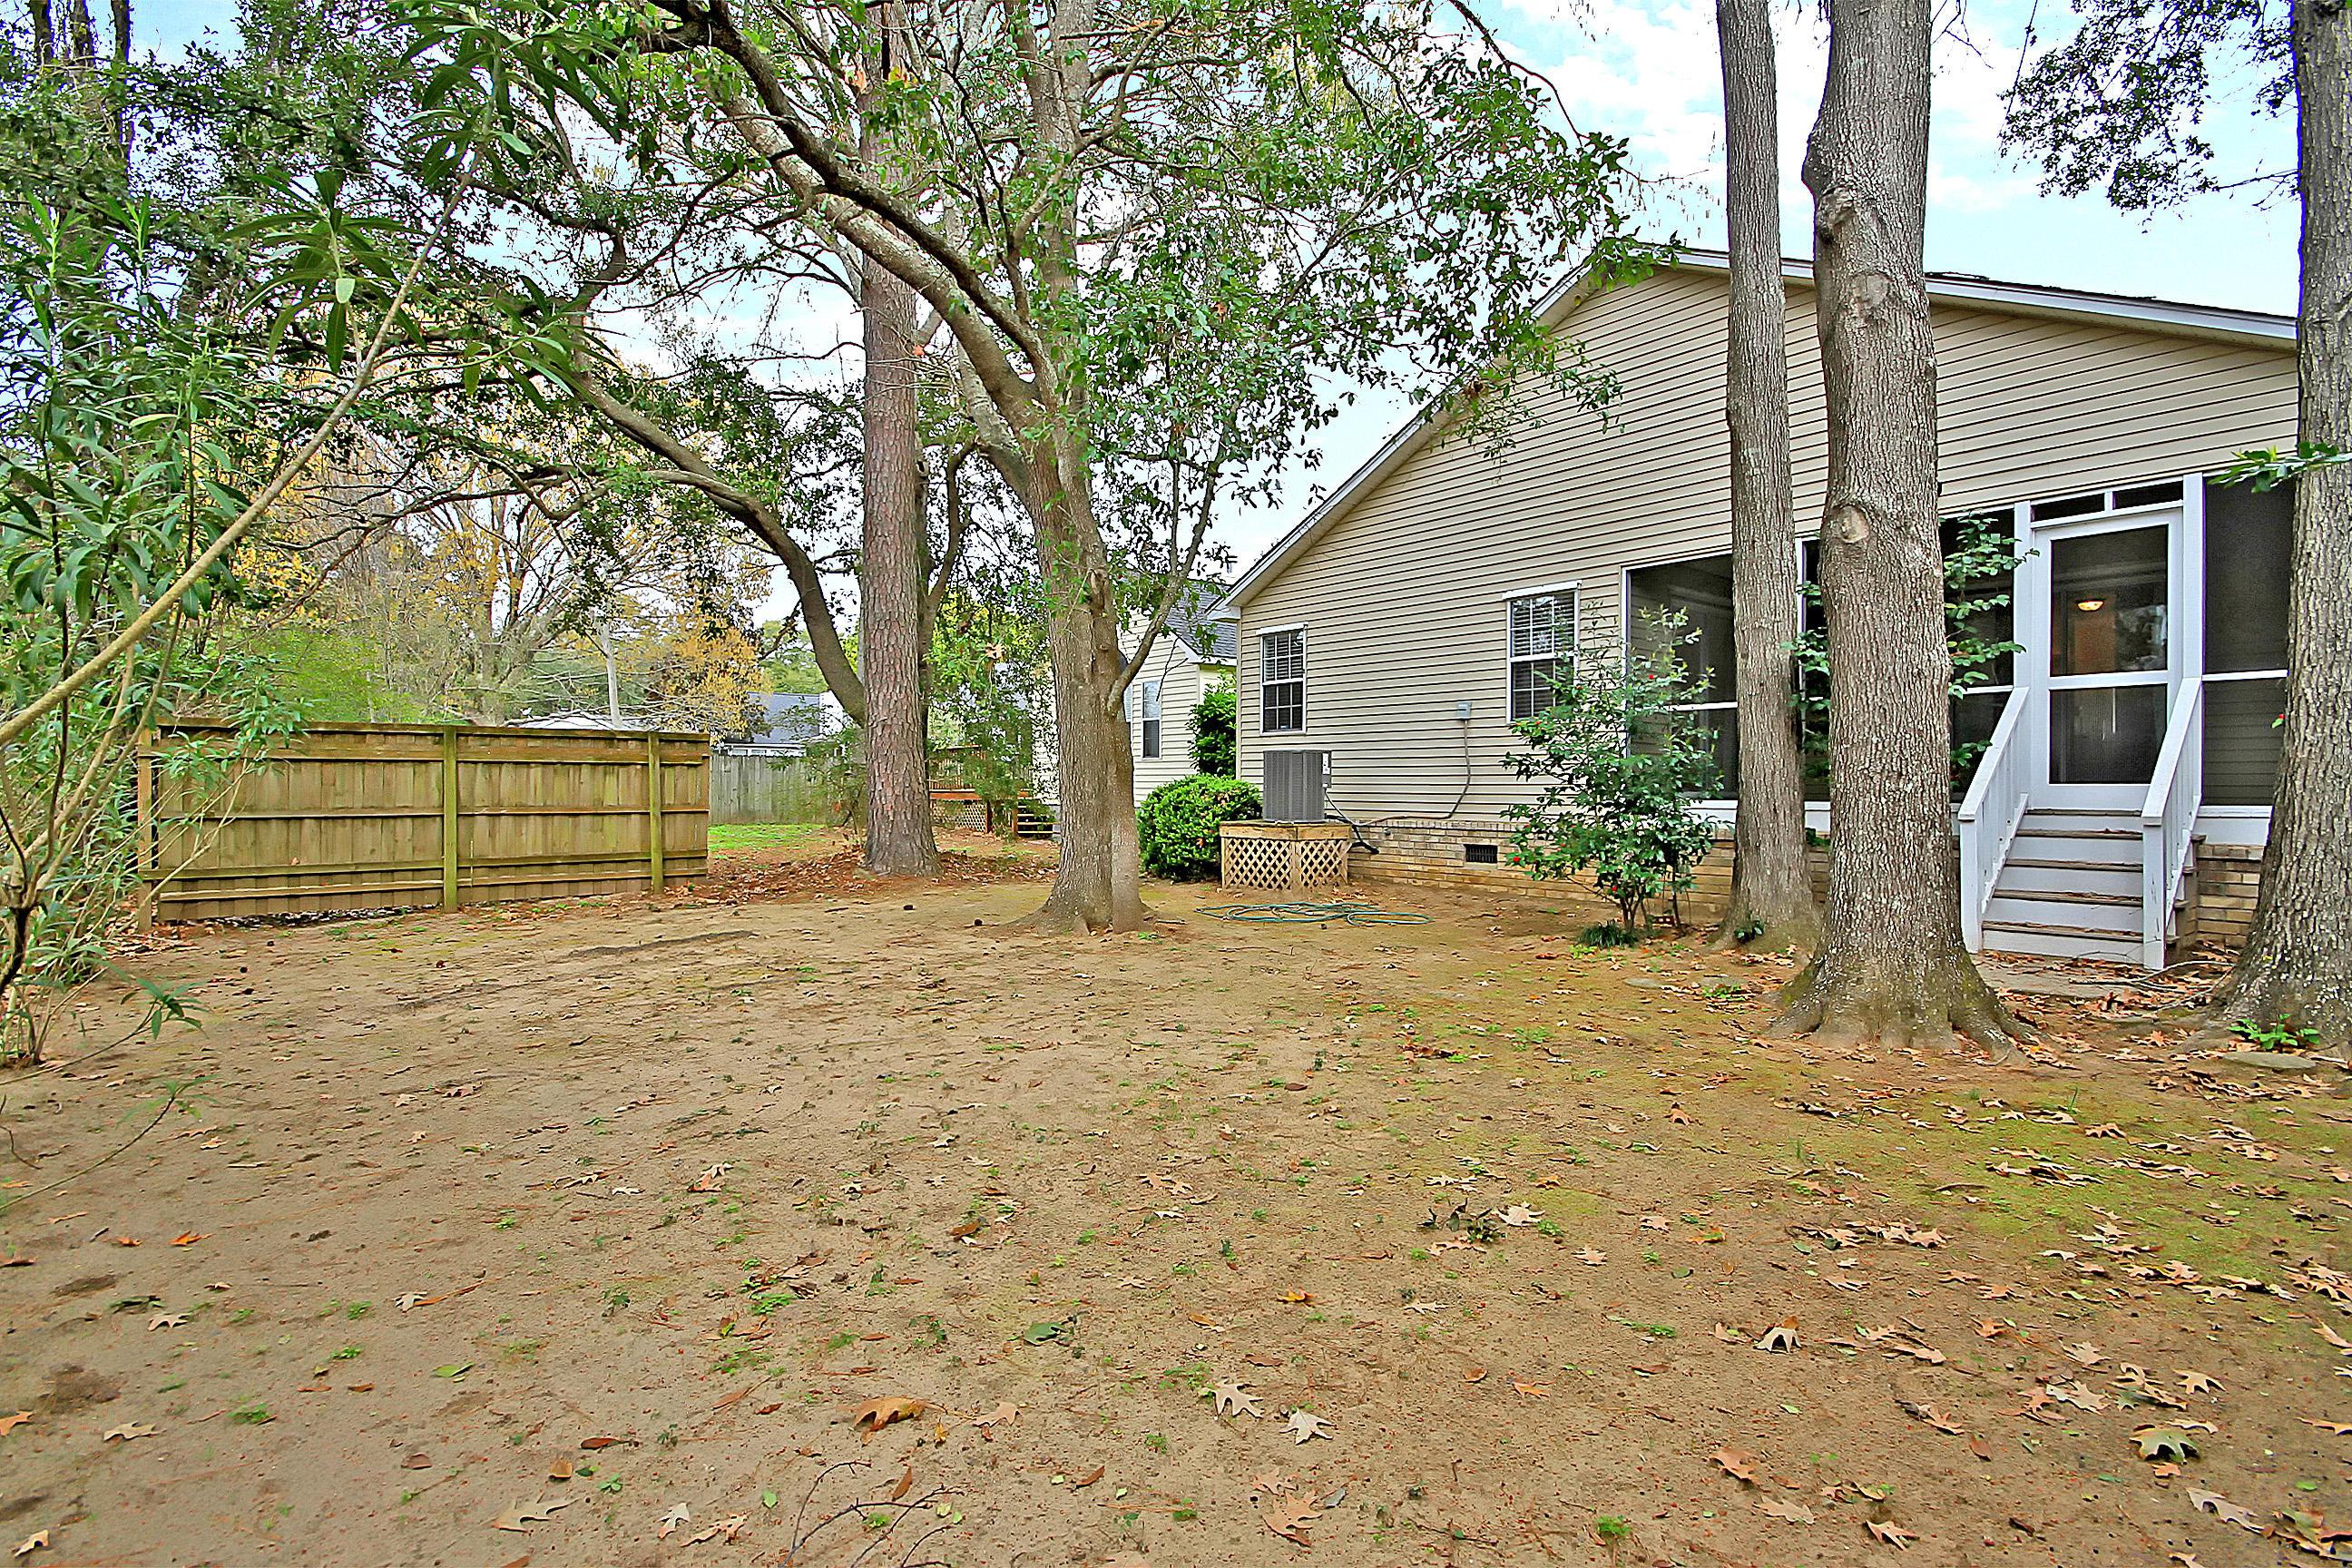 Harbor Place Homes For Sale - 845 Harbor Pl, Charleston, SC - 16